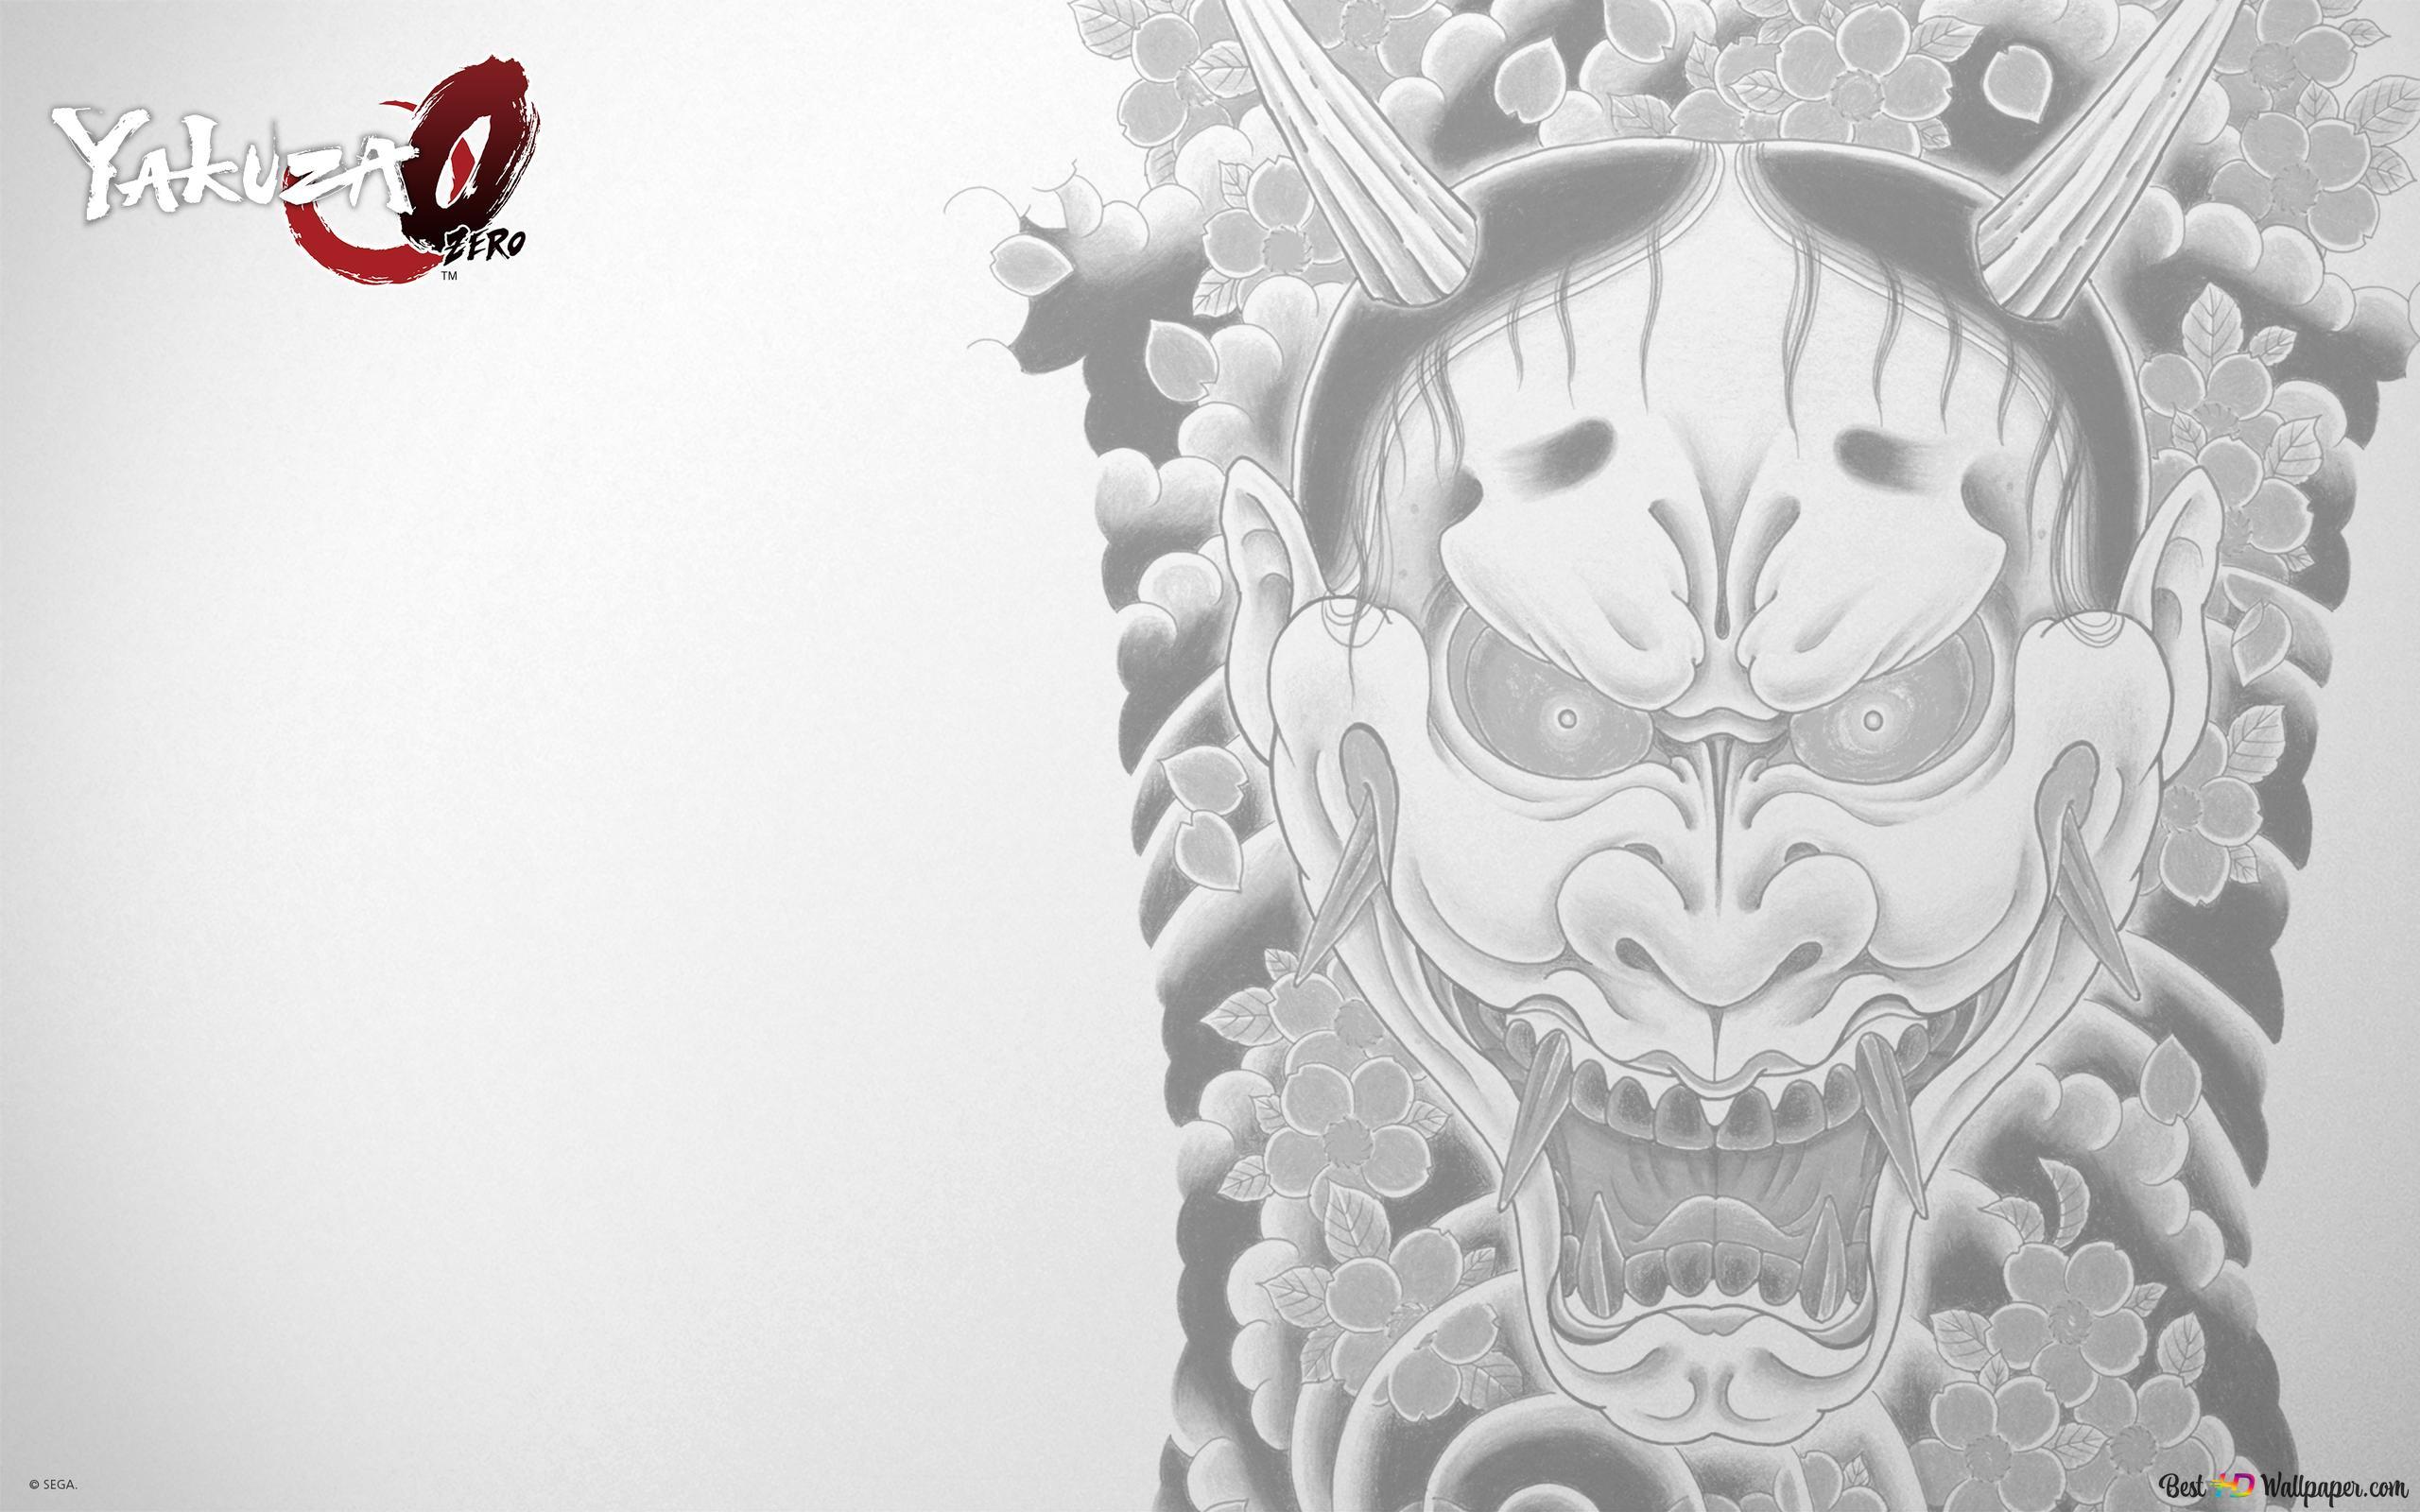 Yakuza 0 Mask Tattoo Hd Wallpaper Download